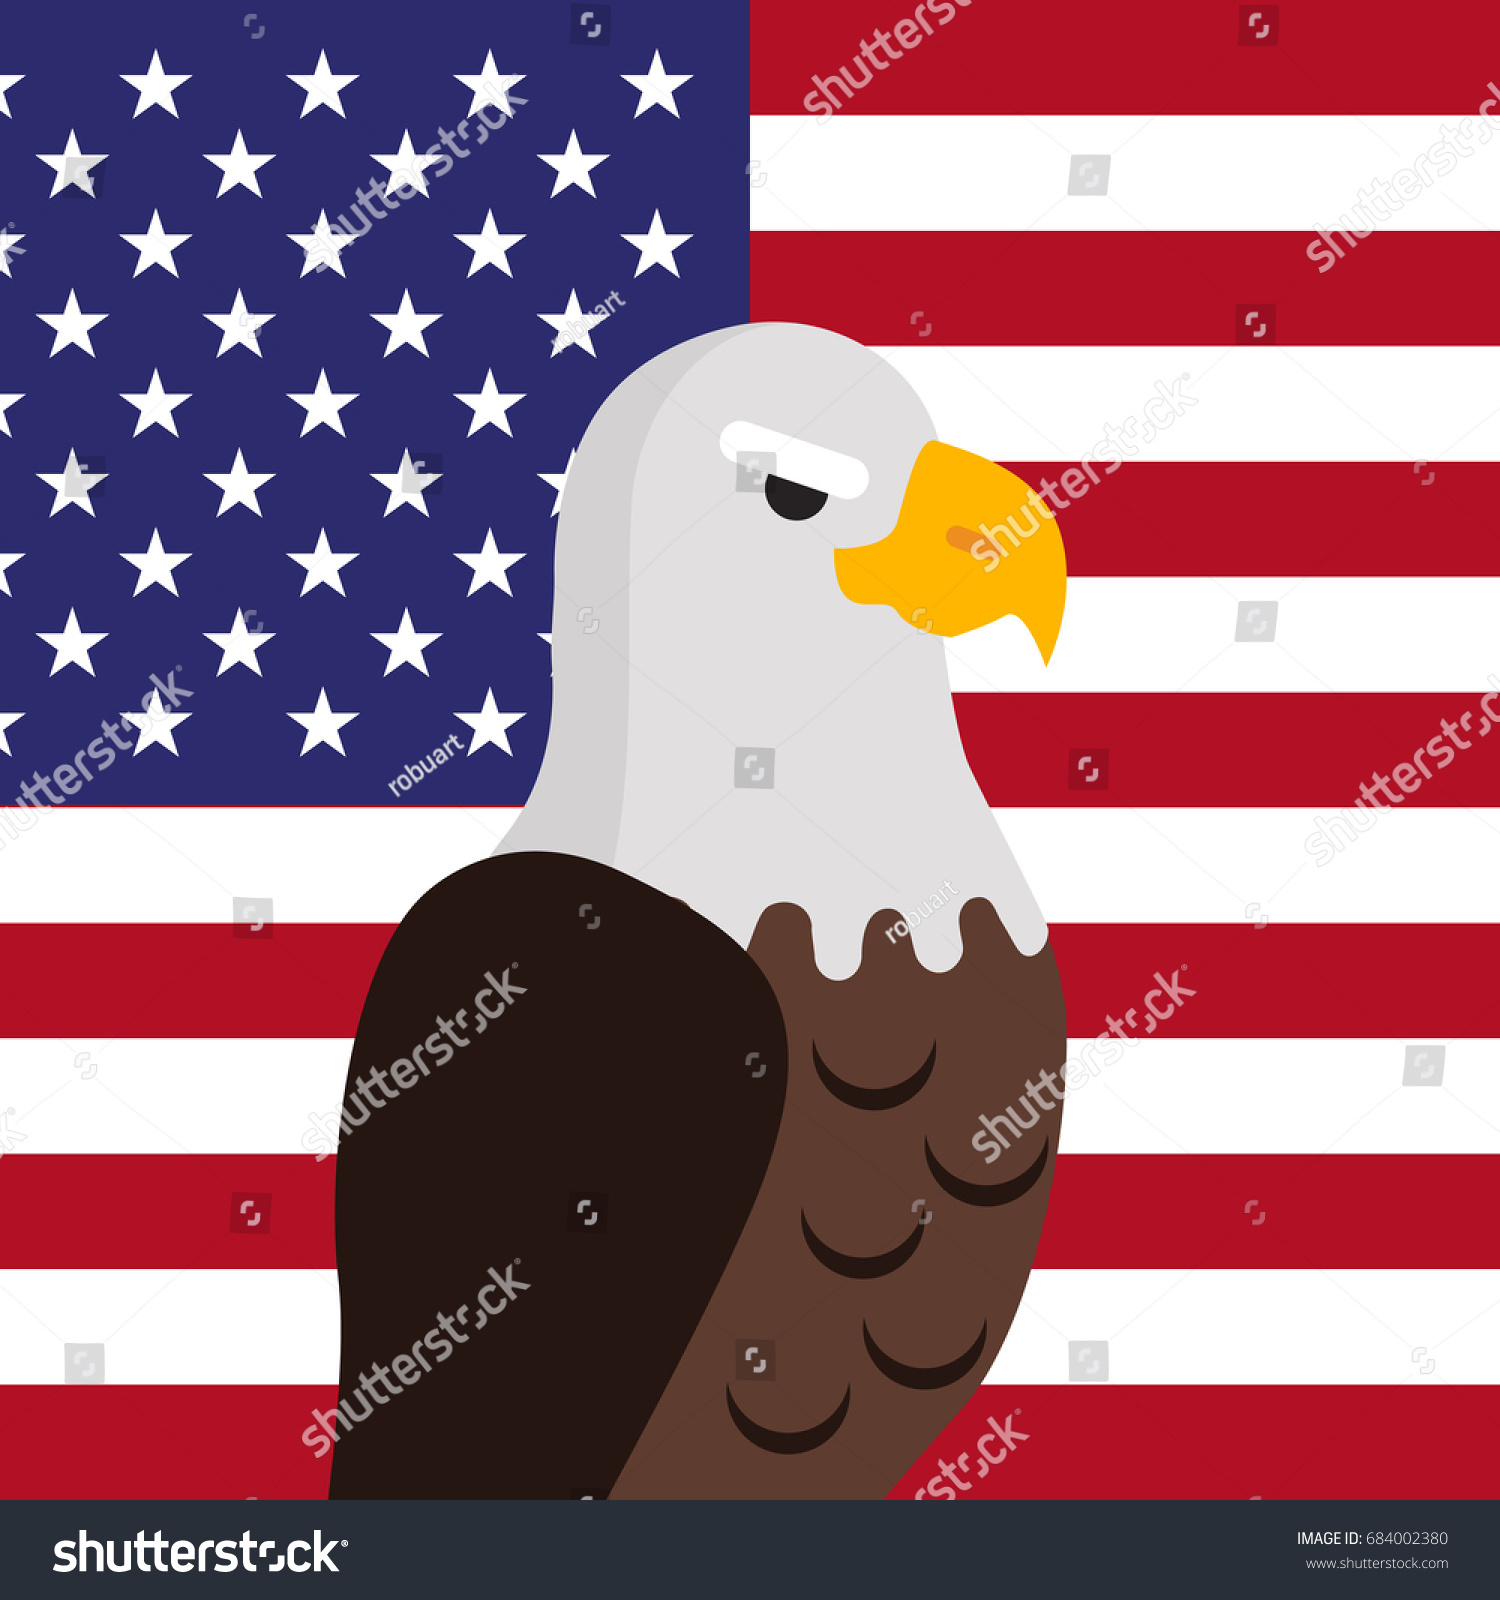 Bald eagle usa national bird symbol stock illustration 684002380 usa national bird symbol and flag for patriotic national symbolic patriotic posters sciox Choice Image